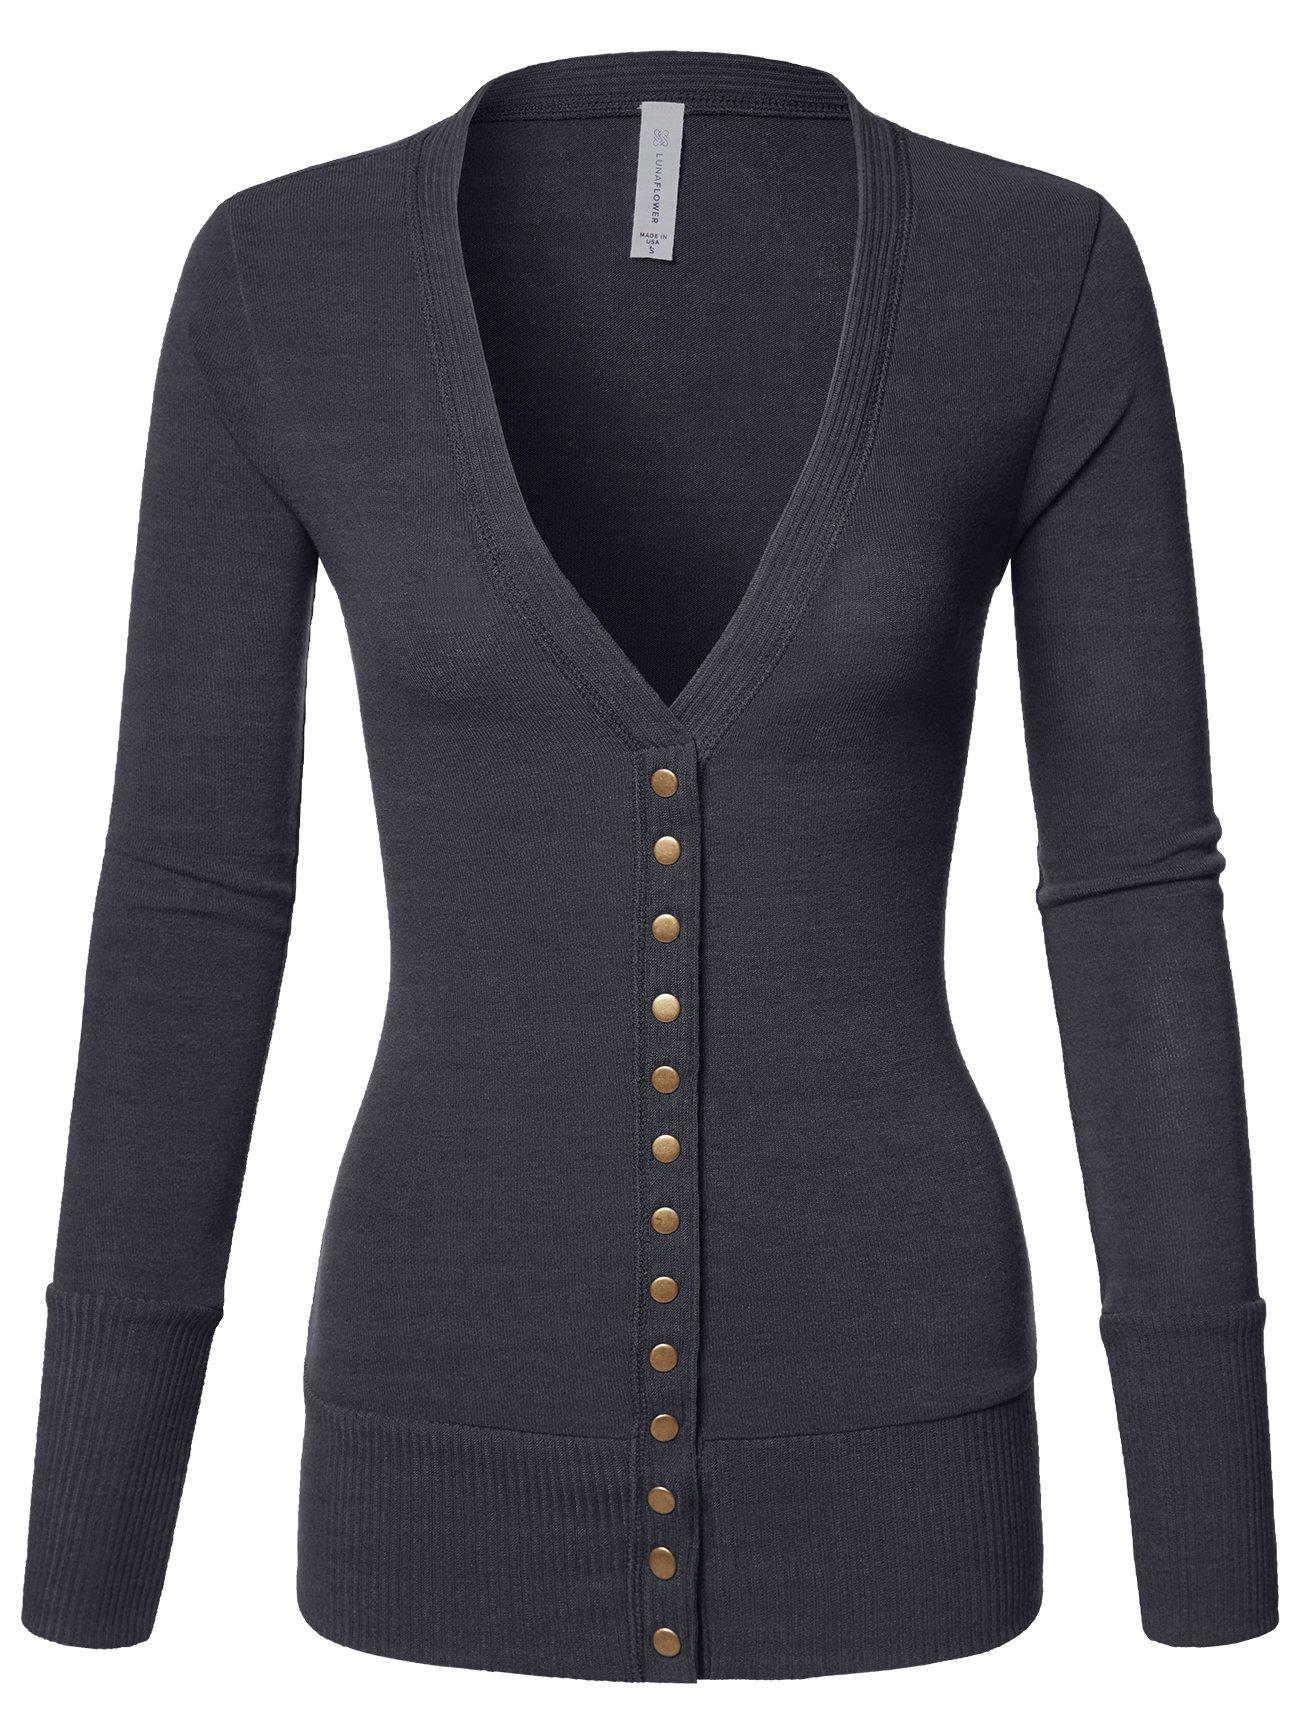 Luna Flower Women's V-Neck Snap Button Long Sleeve Soft Basic Knit Snap Cardigan Sweater Charcoal Large (GCDW027)